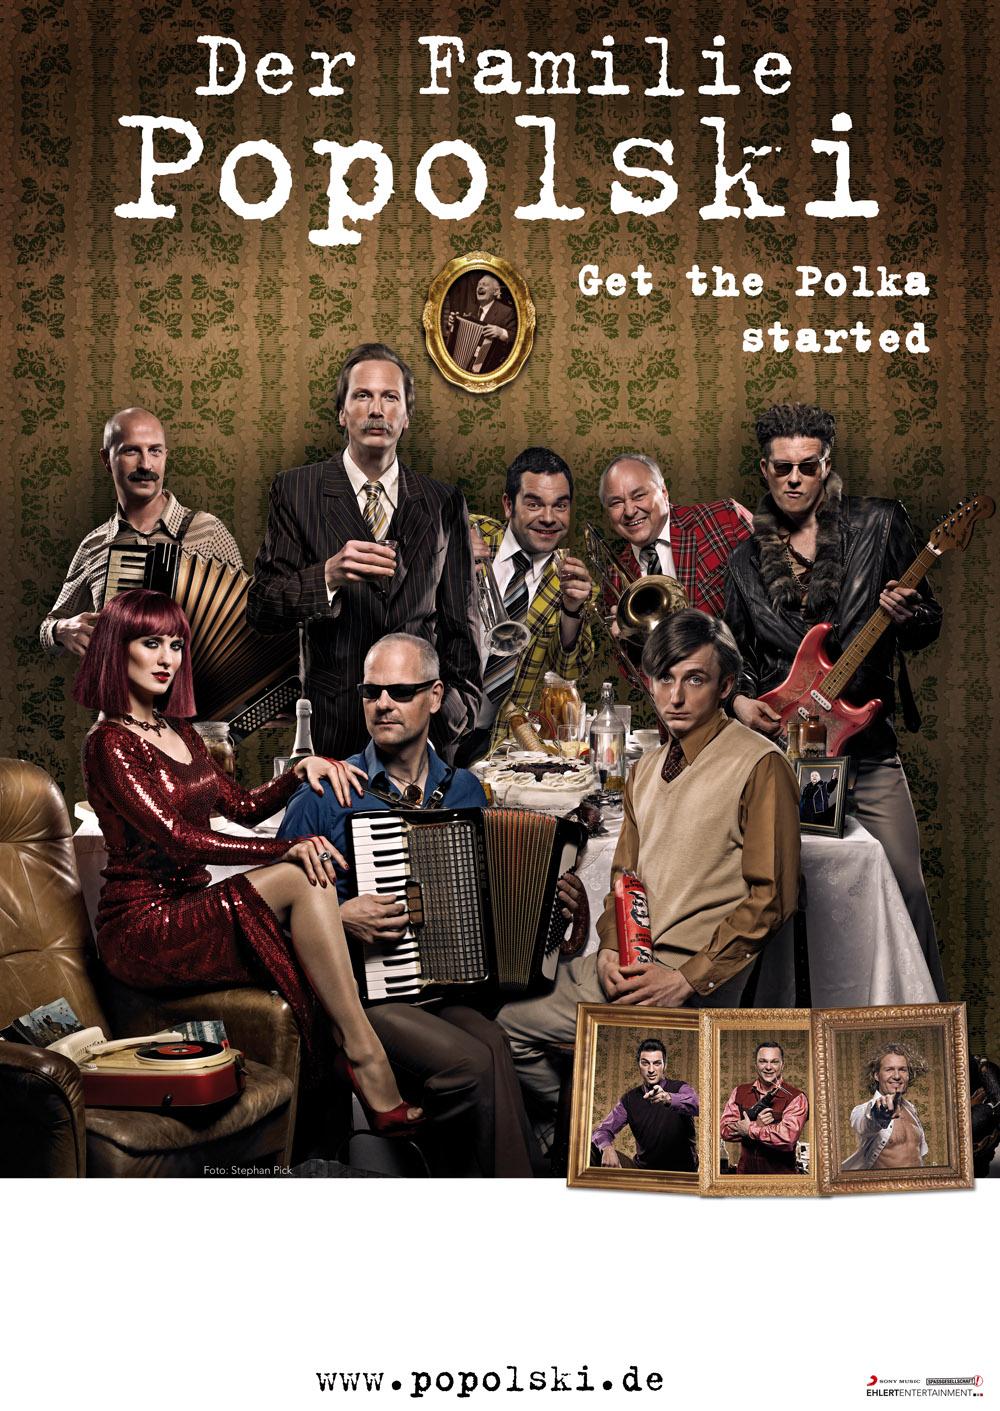 Familie Popolski